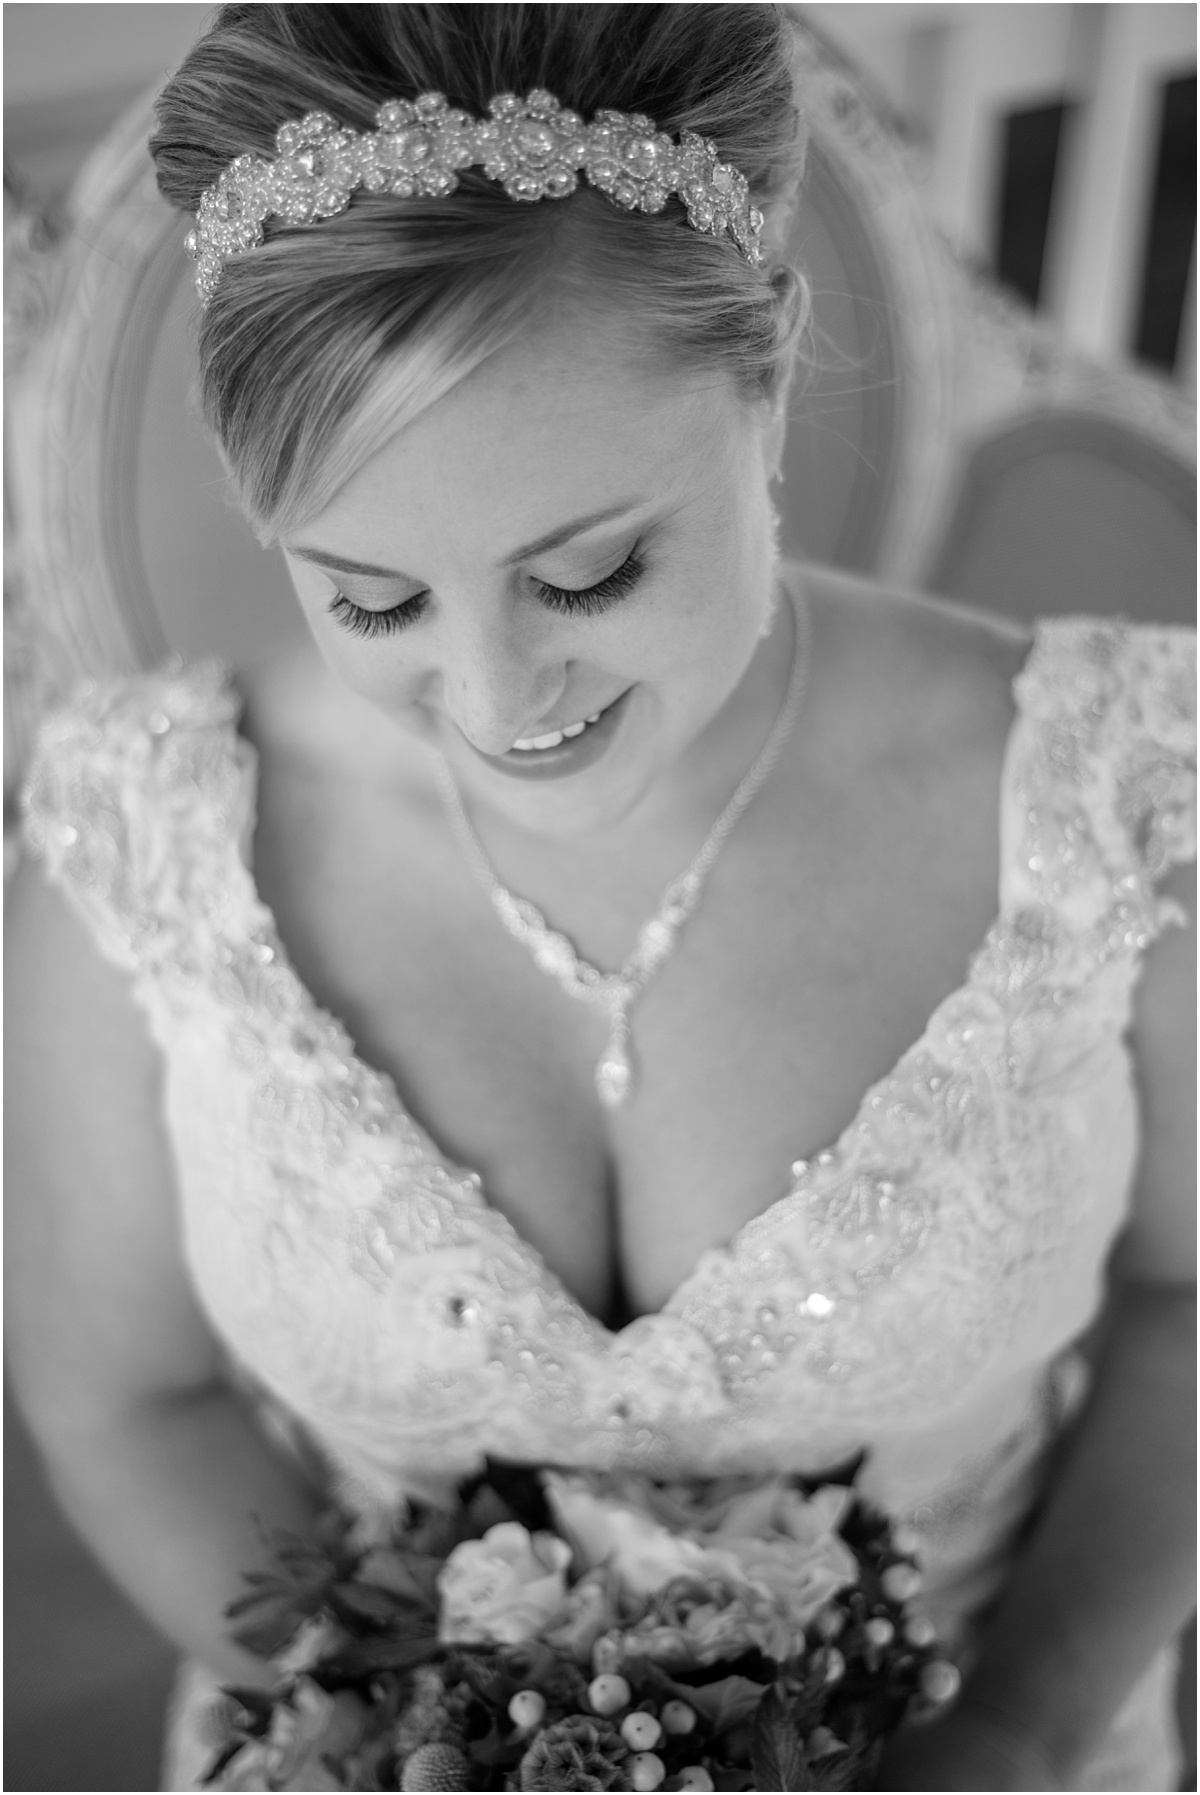 Greg Smit Photography Nashville wedding photographer Mint Springs Farm  10